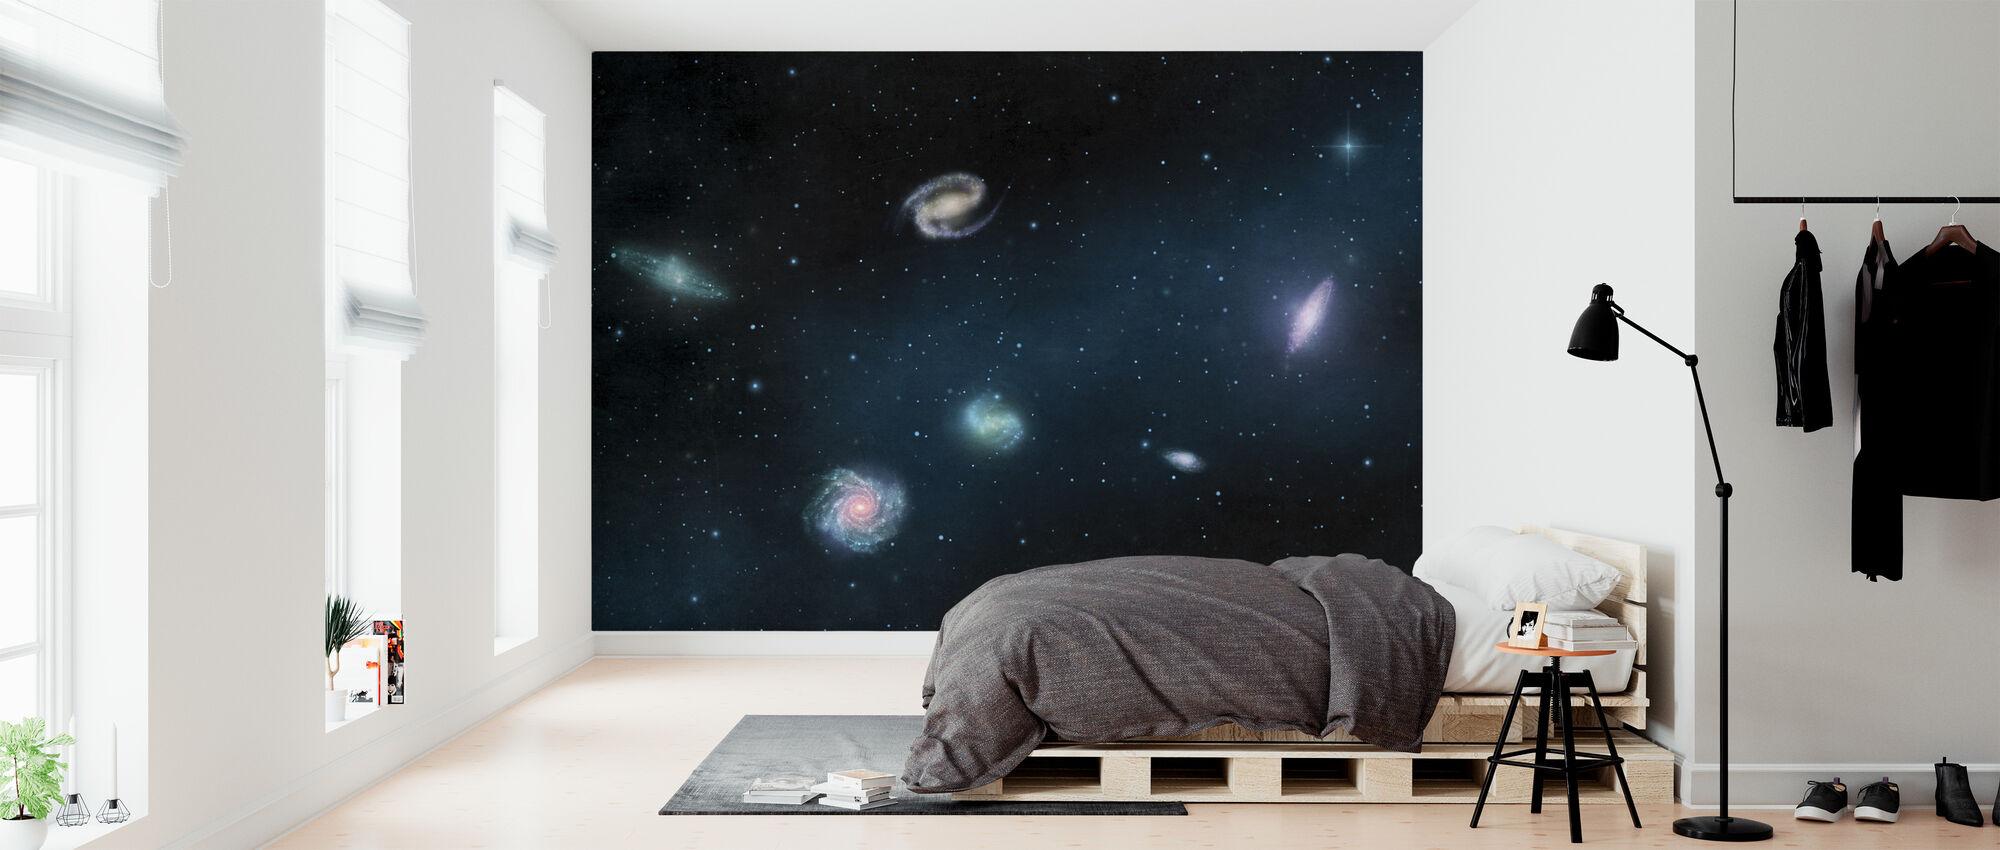 Darkest Dark - Galaxies - Wallpaper - Bedroom